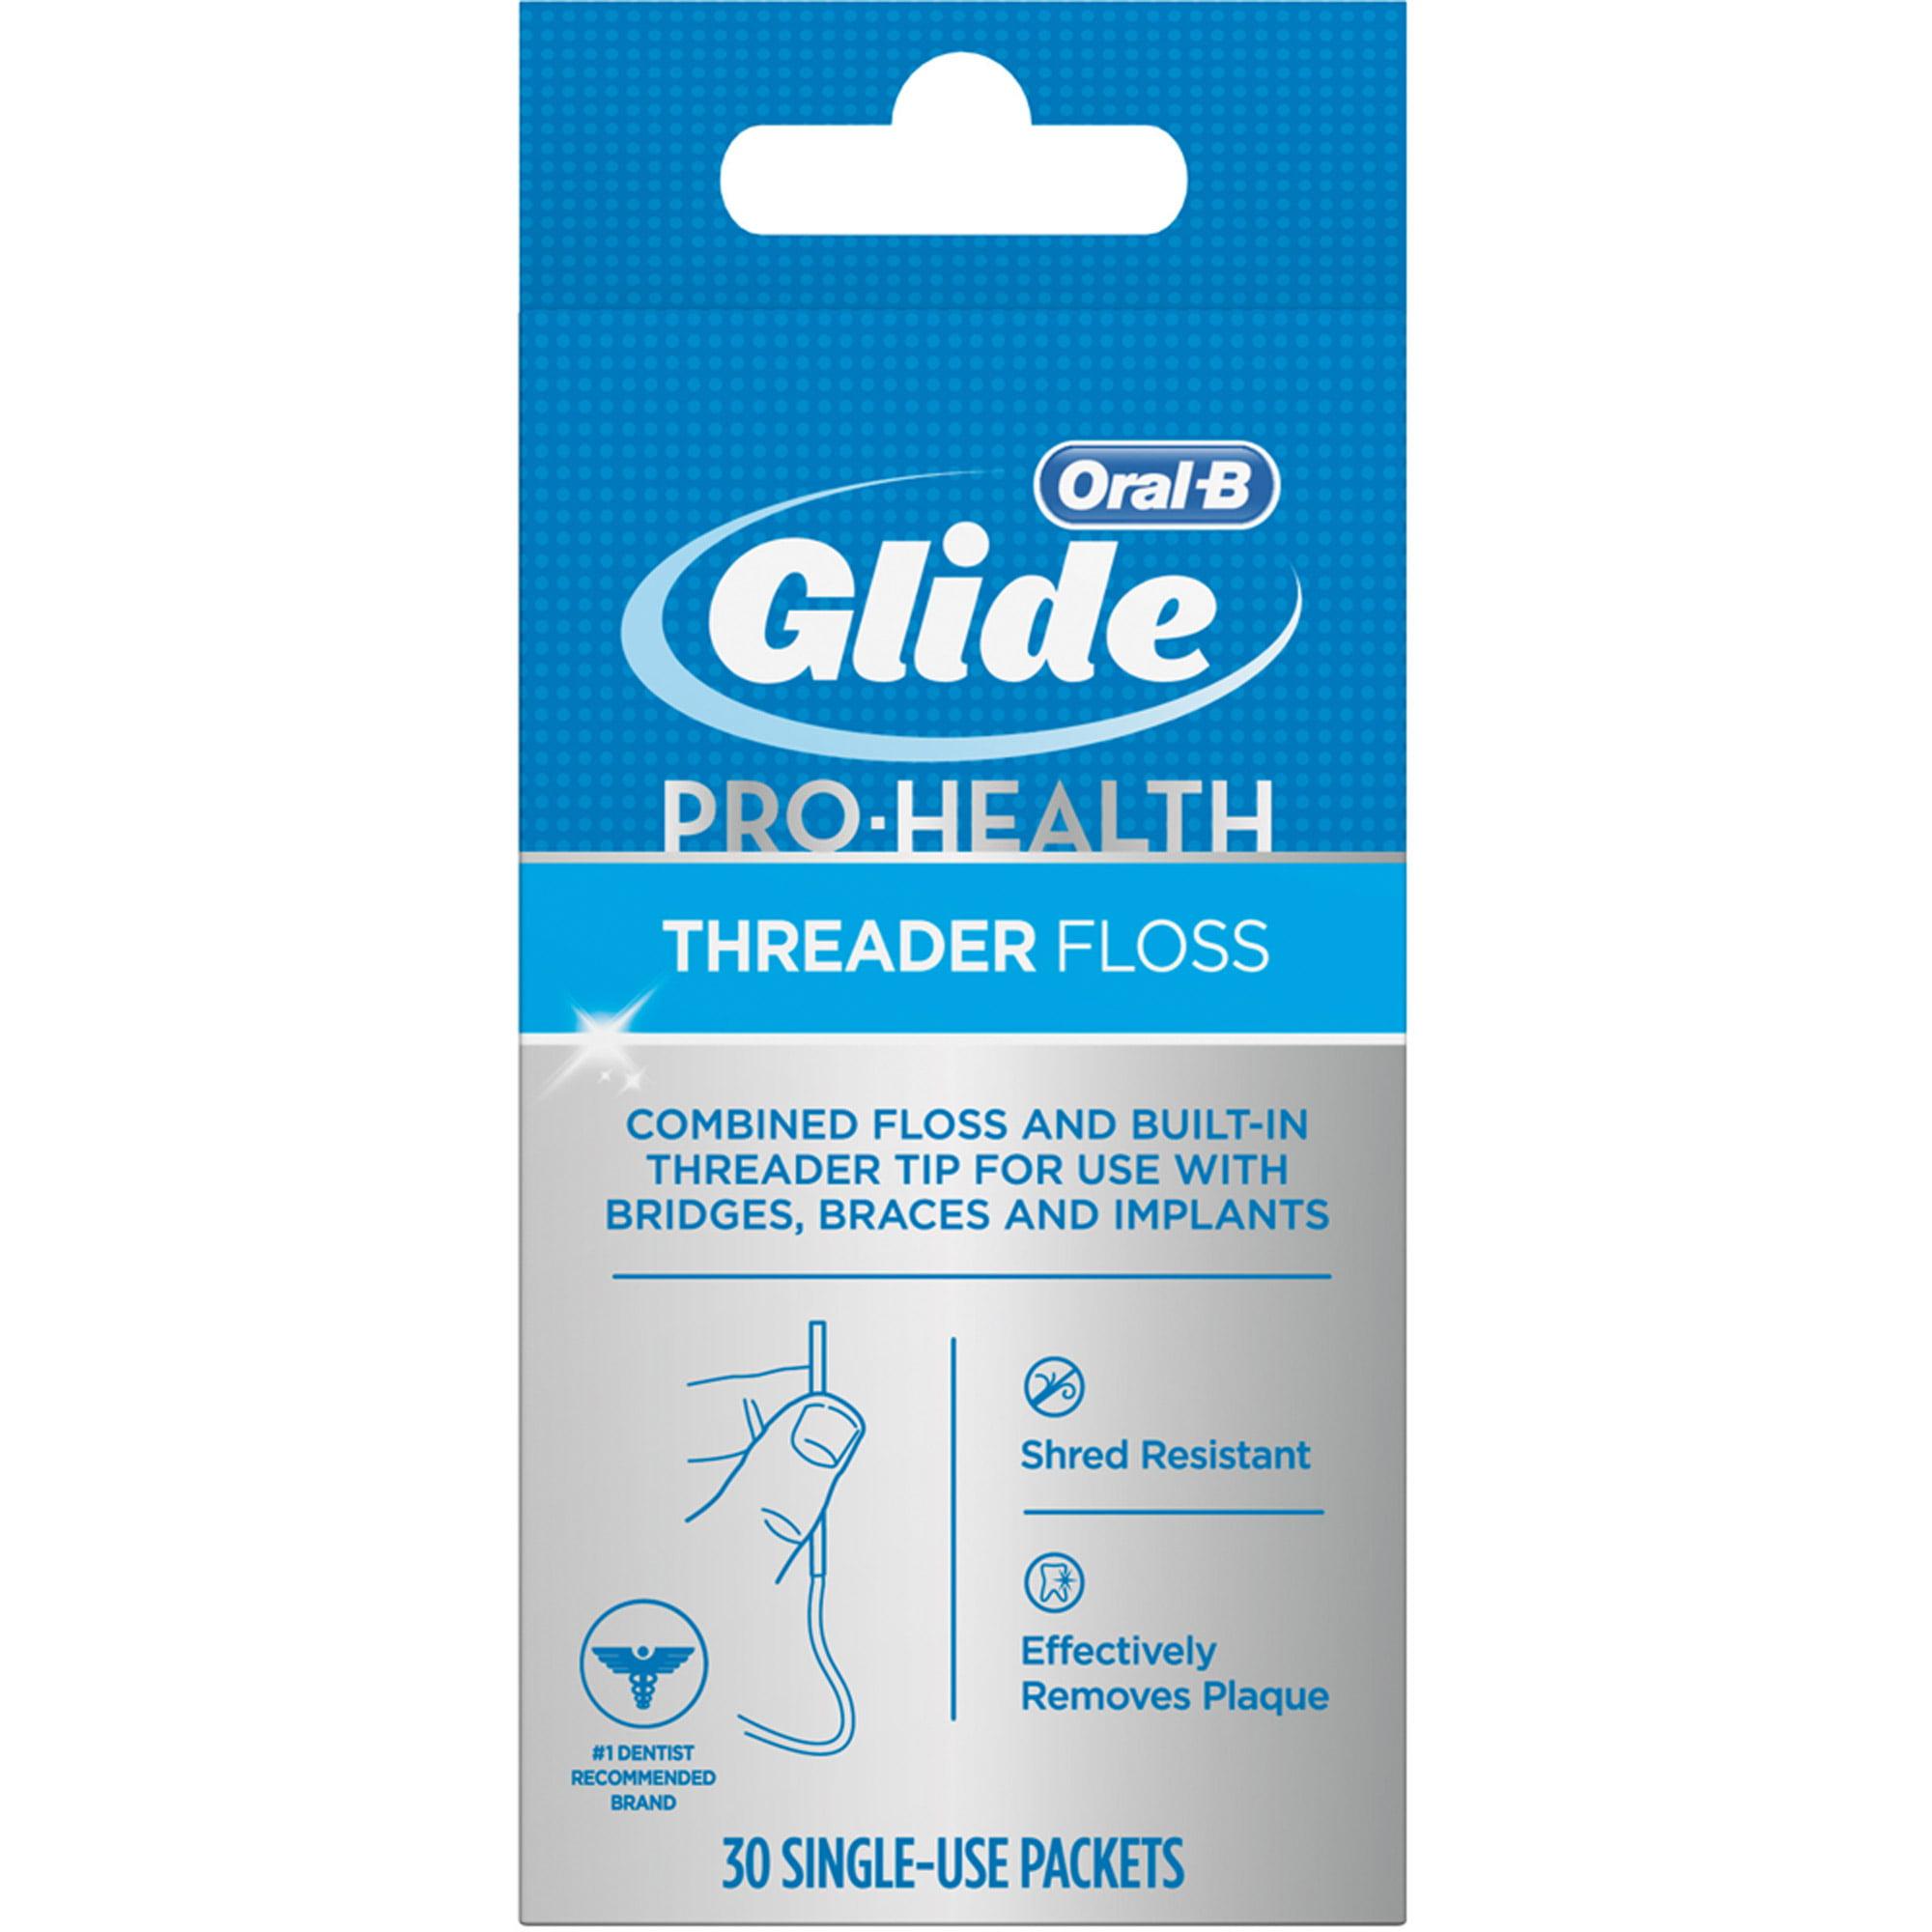 Oral-B Glide Pro-Health Threader Floss, 30 count